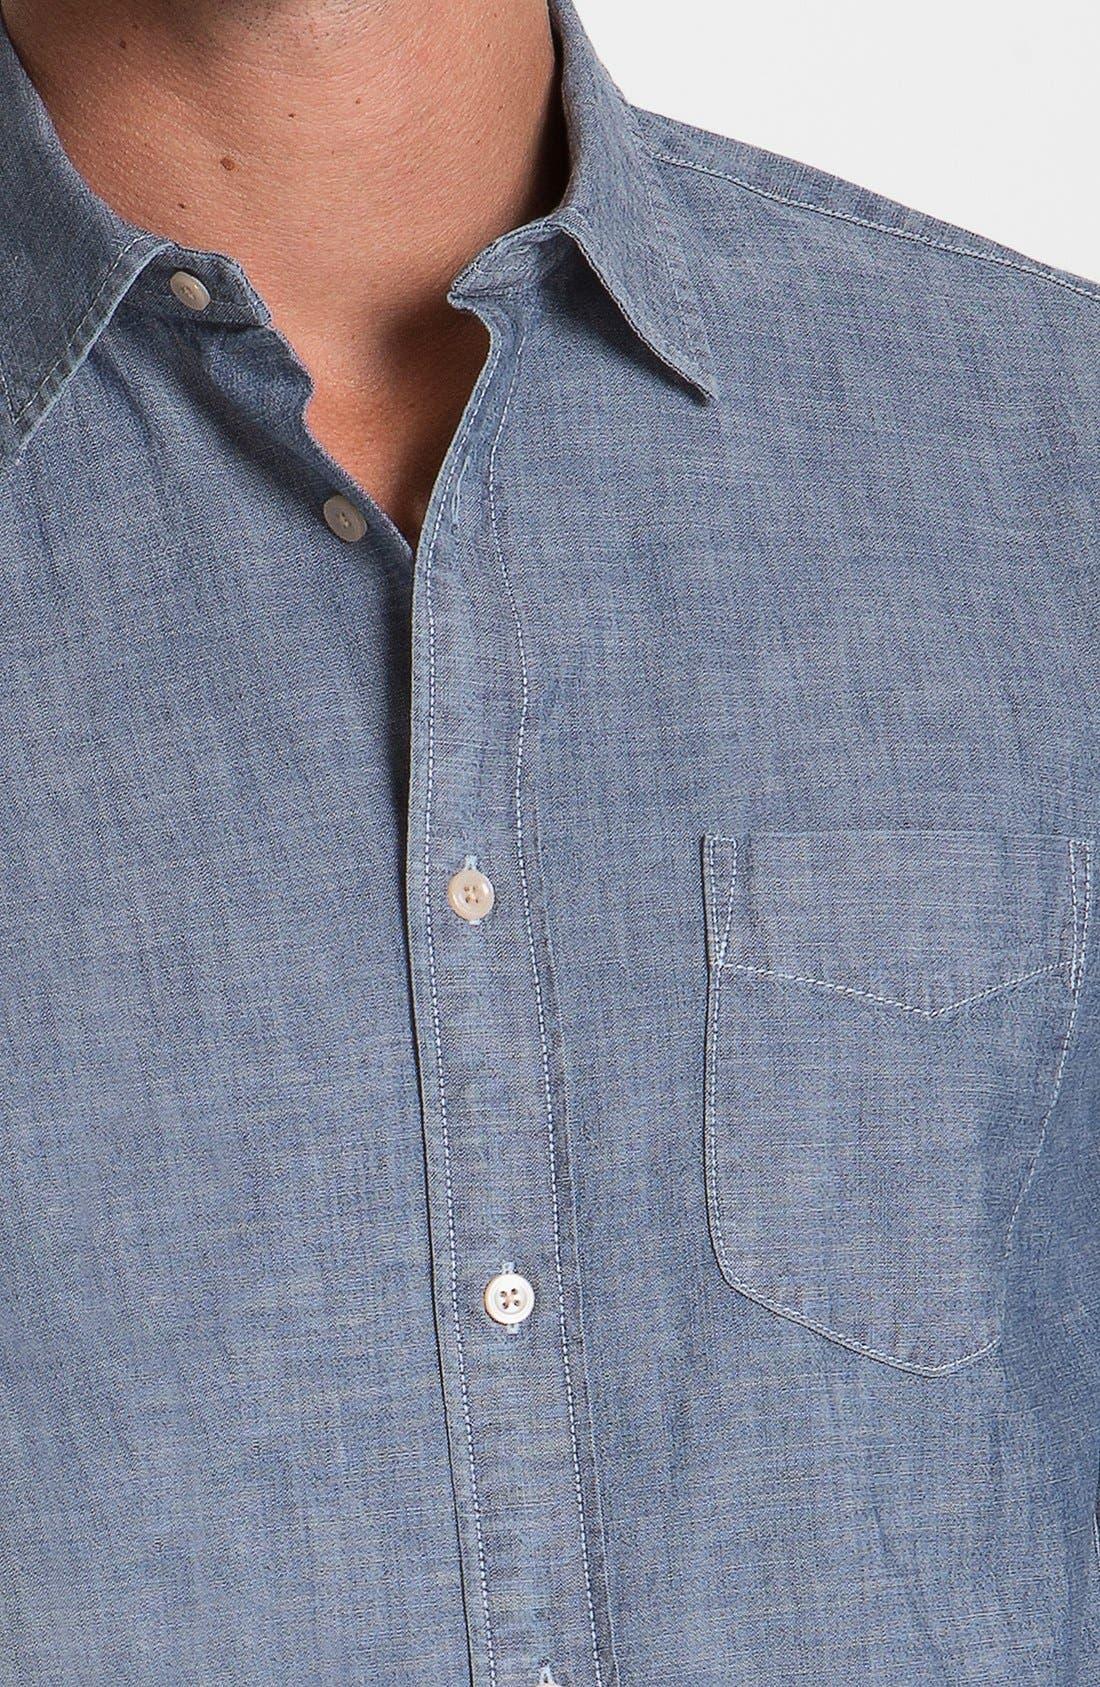 Alternate Image 3  - Façonnable Tailored Denim Regular Fit Chambray Sport Shirt